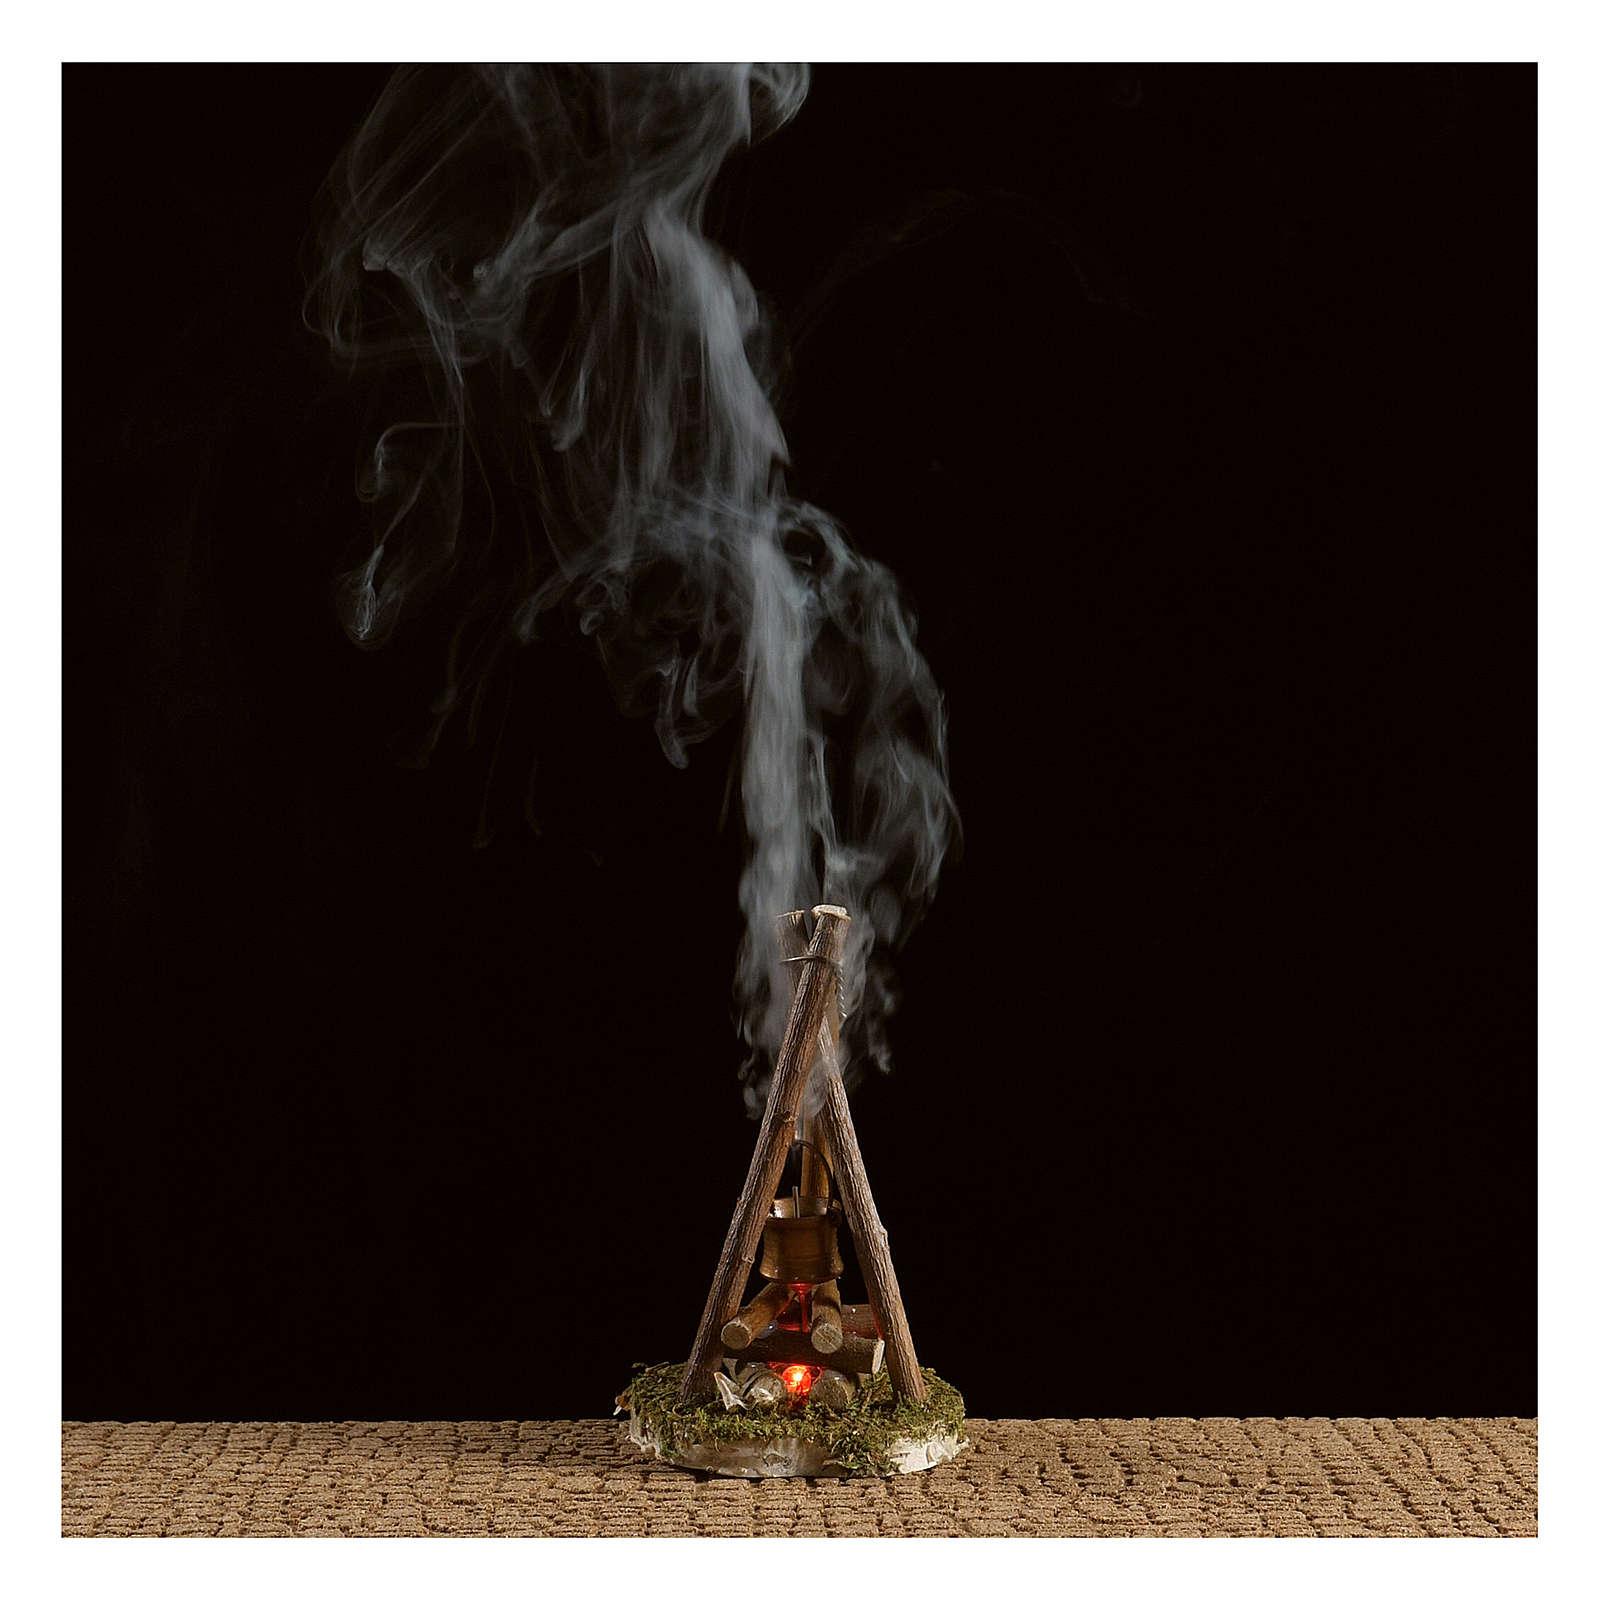 Hoguera belén con humo 4,5 V h. 11x7 cm 4